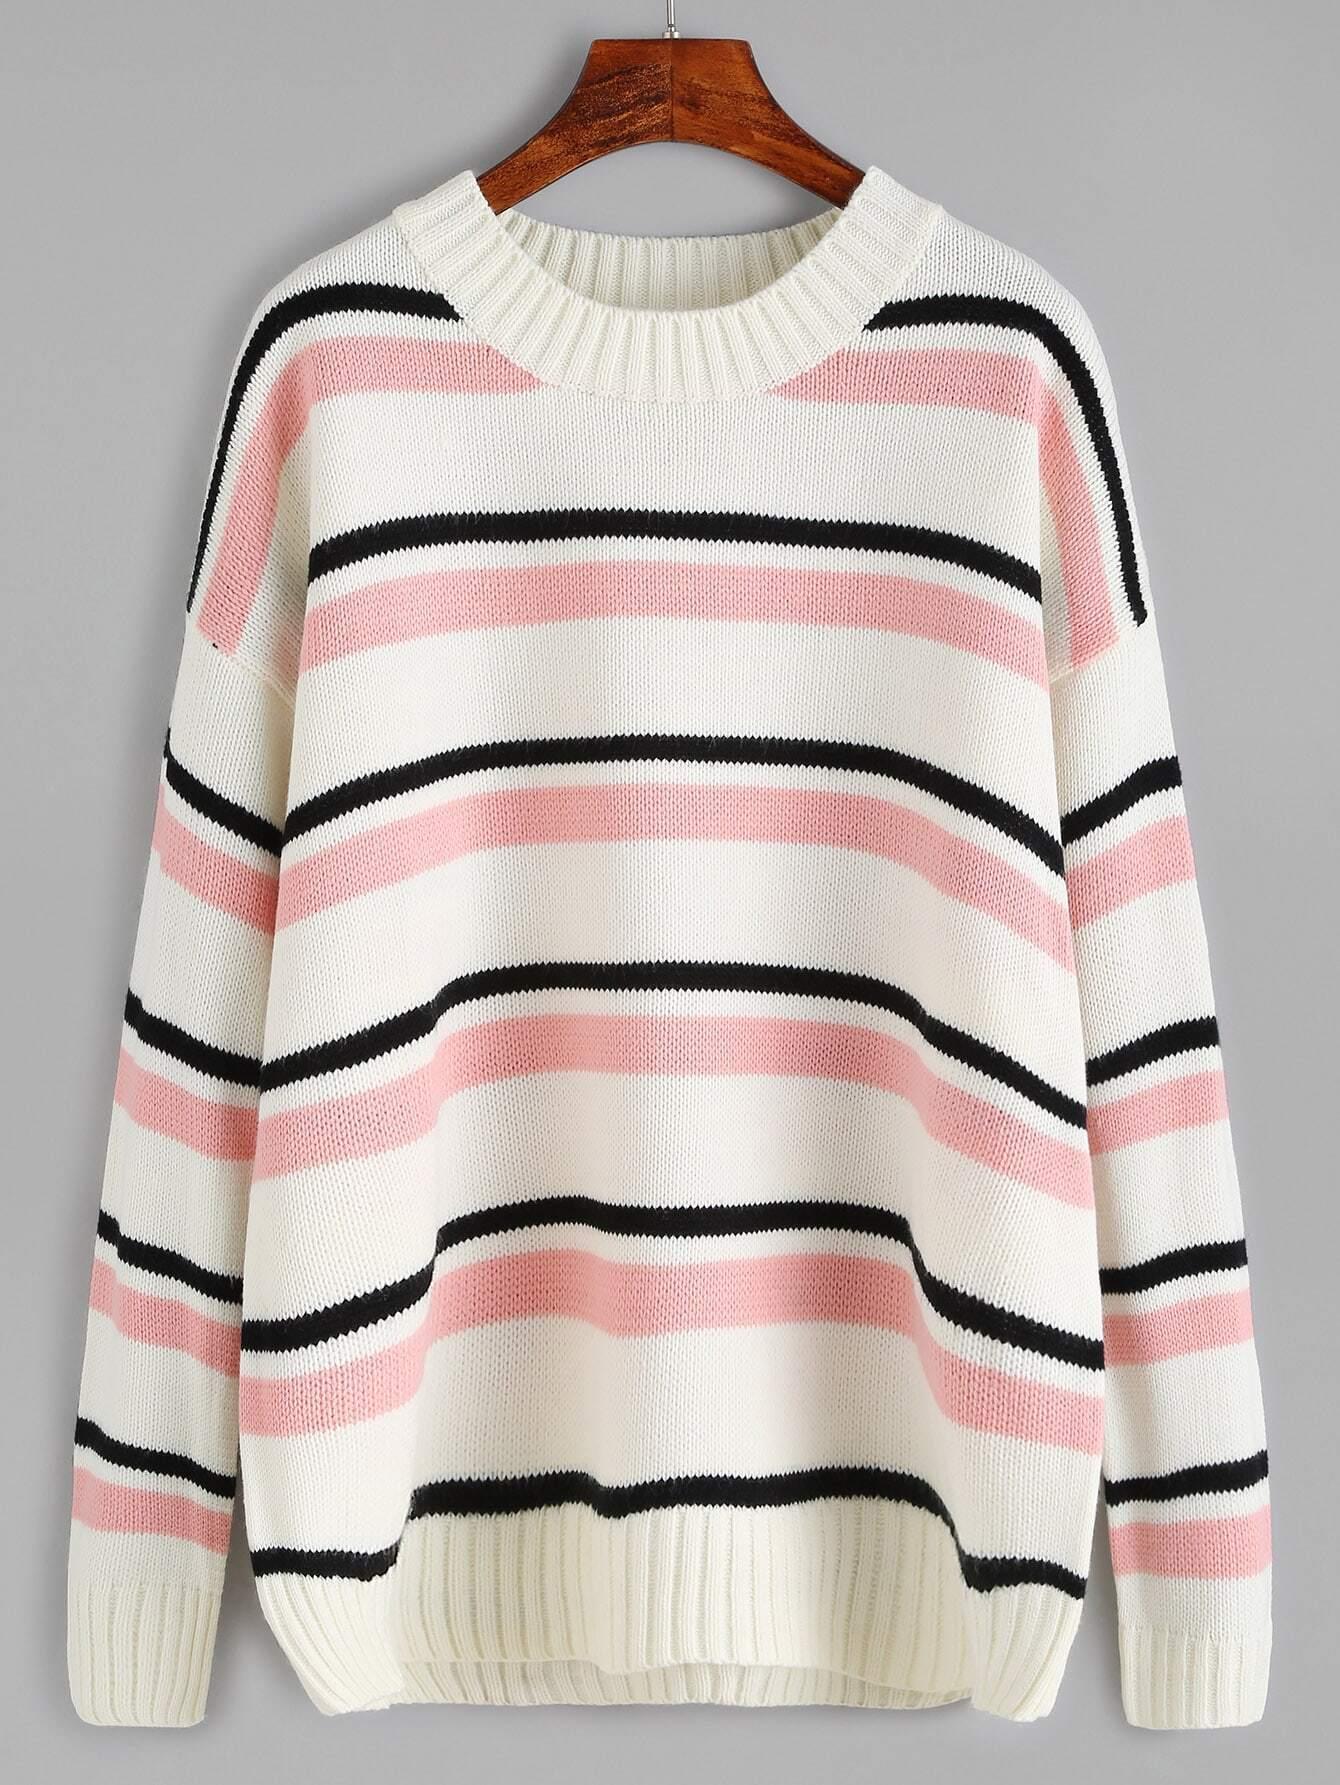 Striped Dropped Shoulder Seam Sweater RKNI160923104